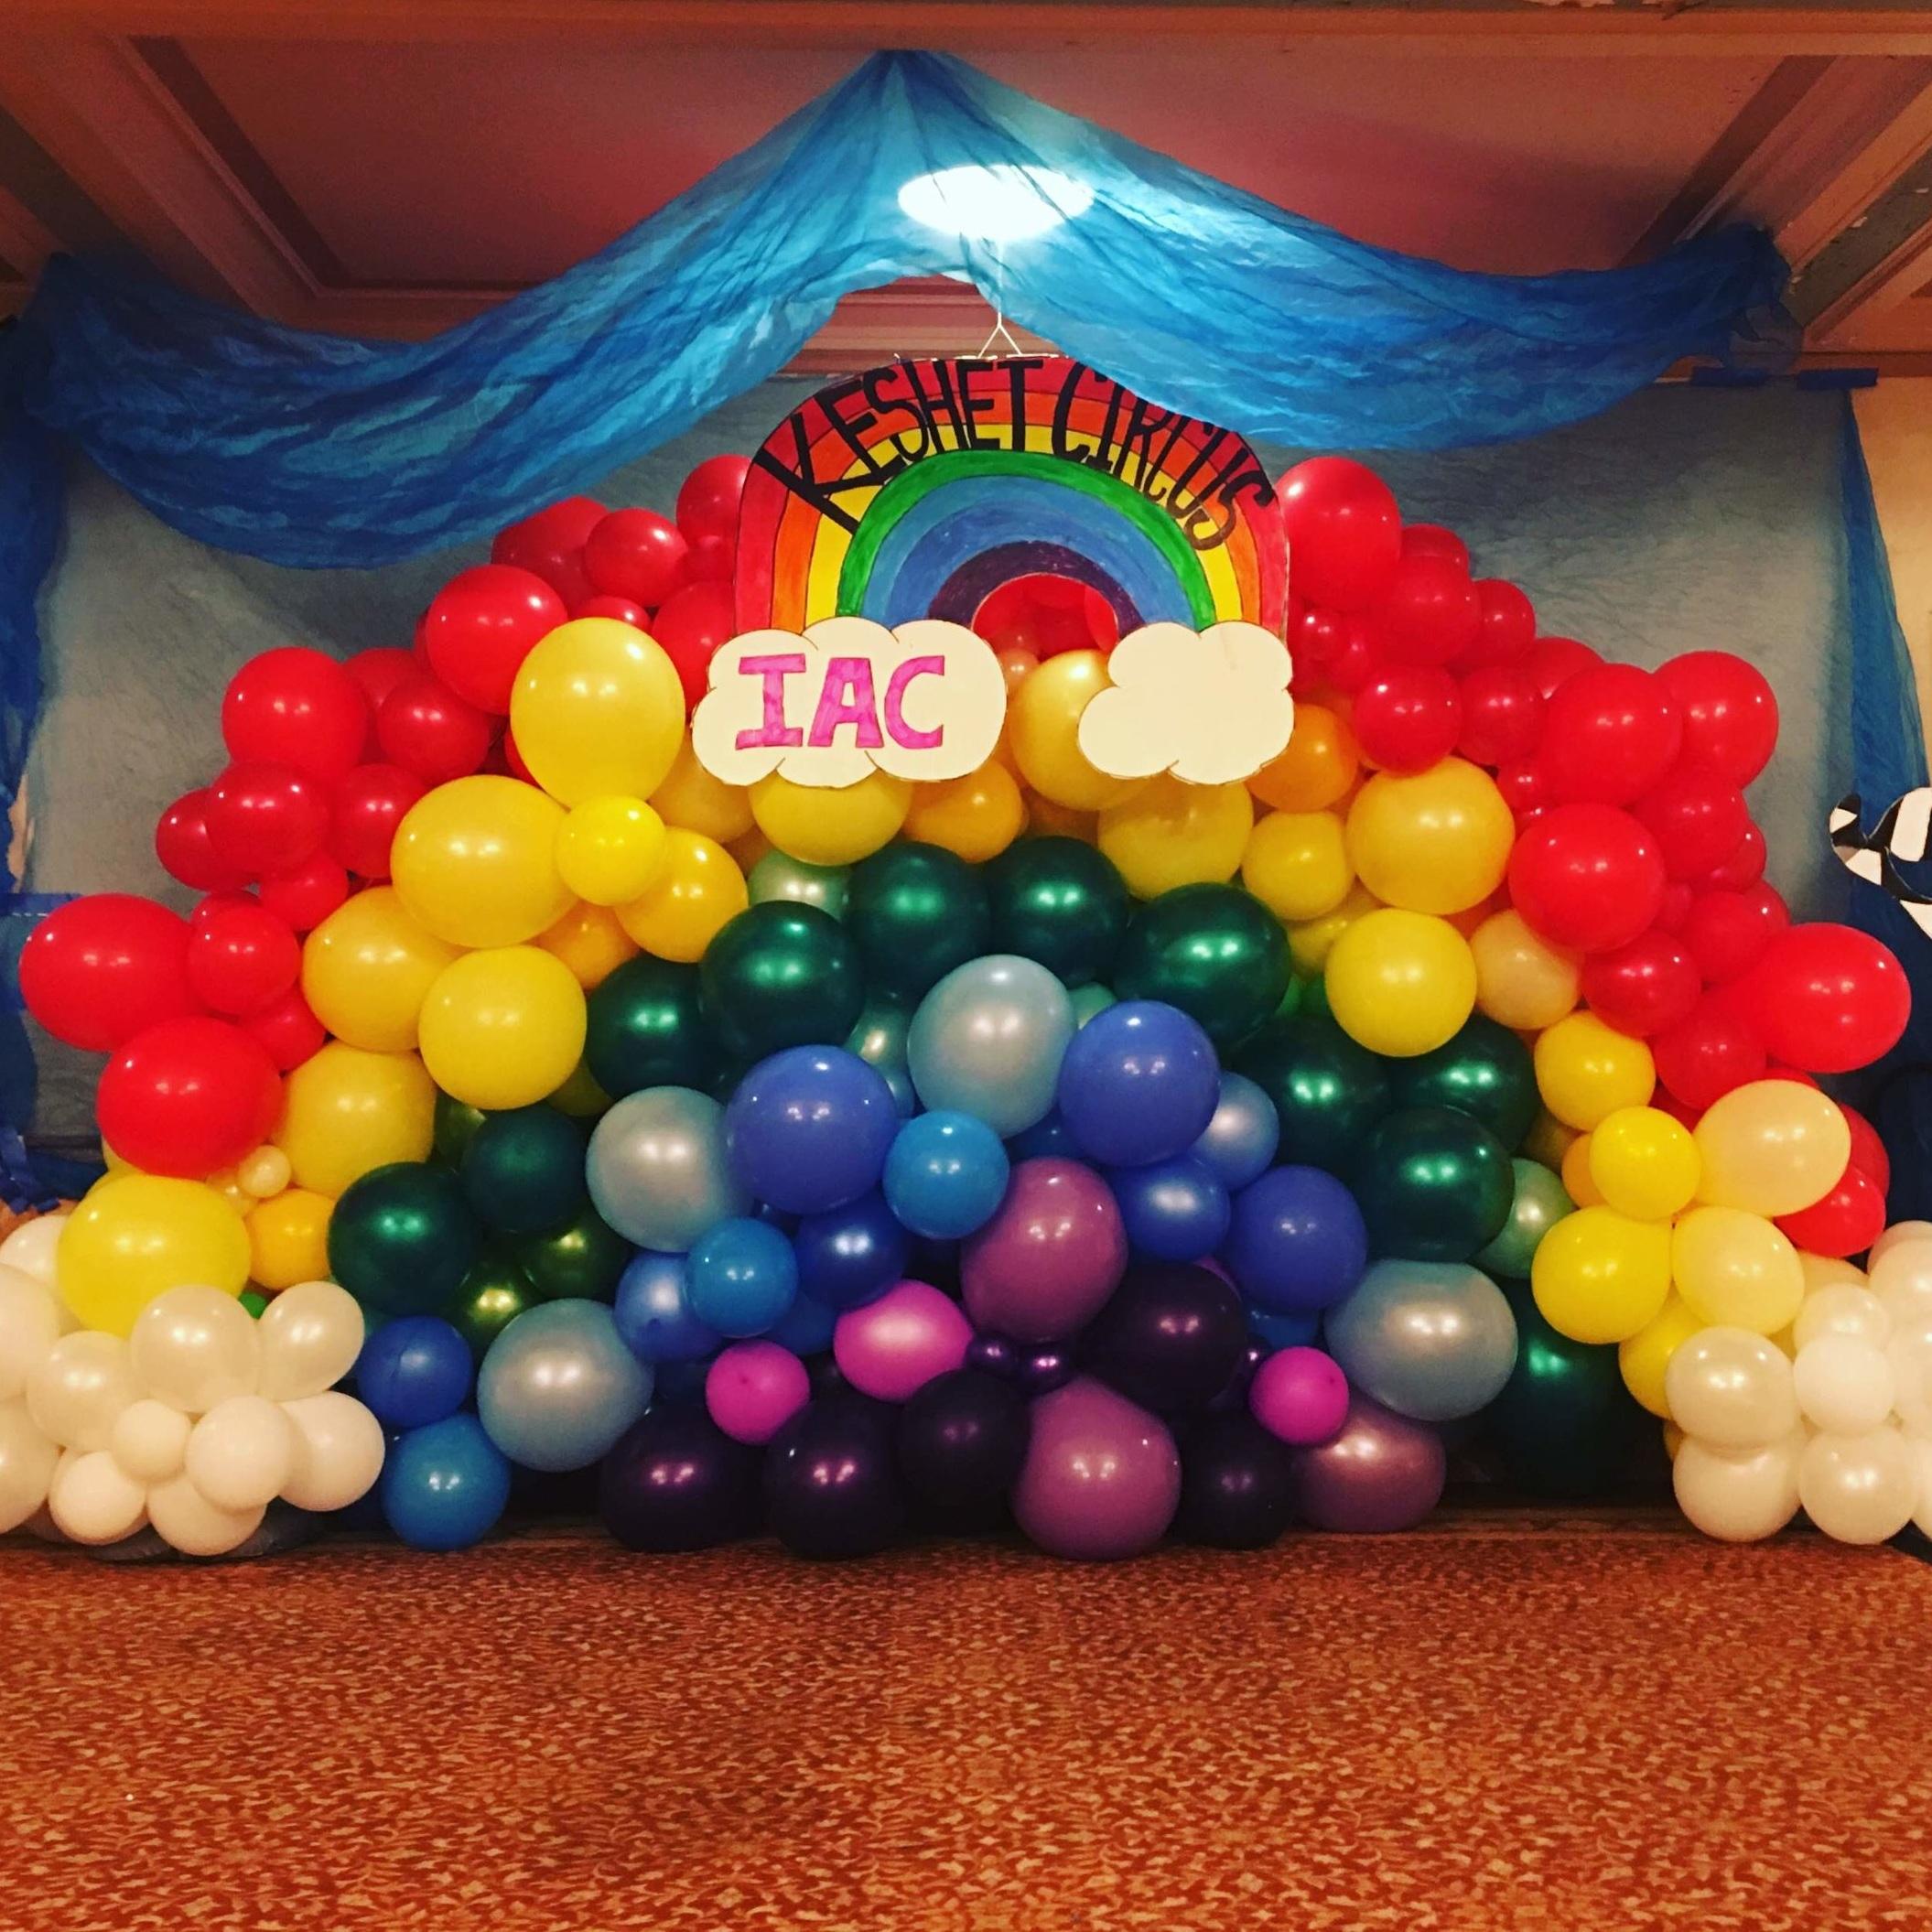 Decor Rainbow IAC.jpg